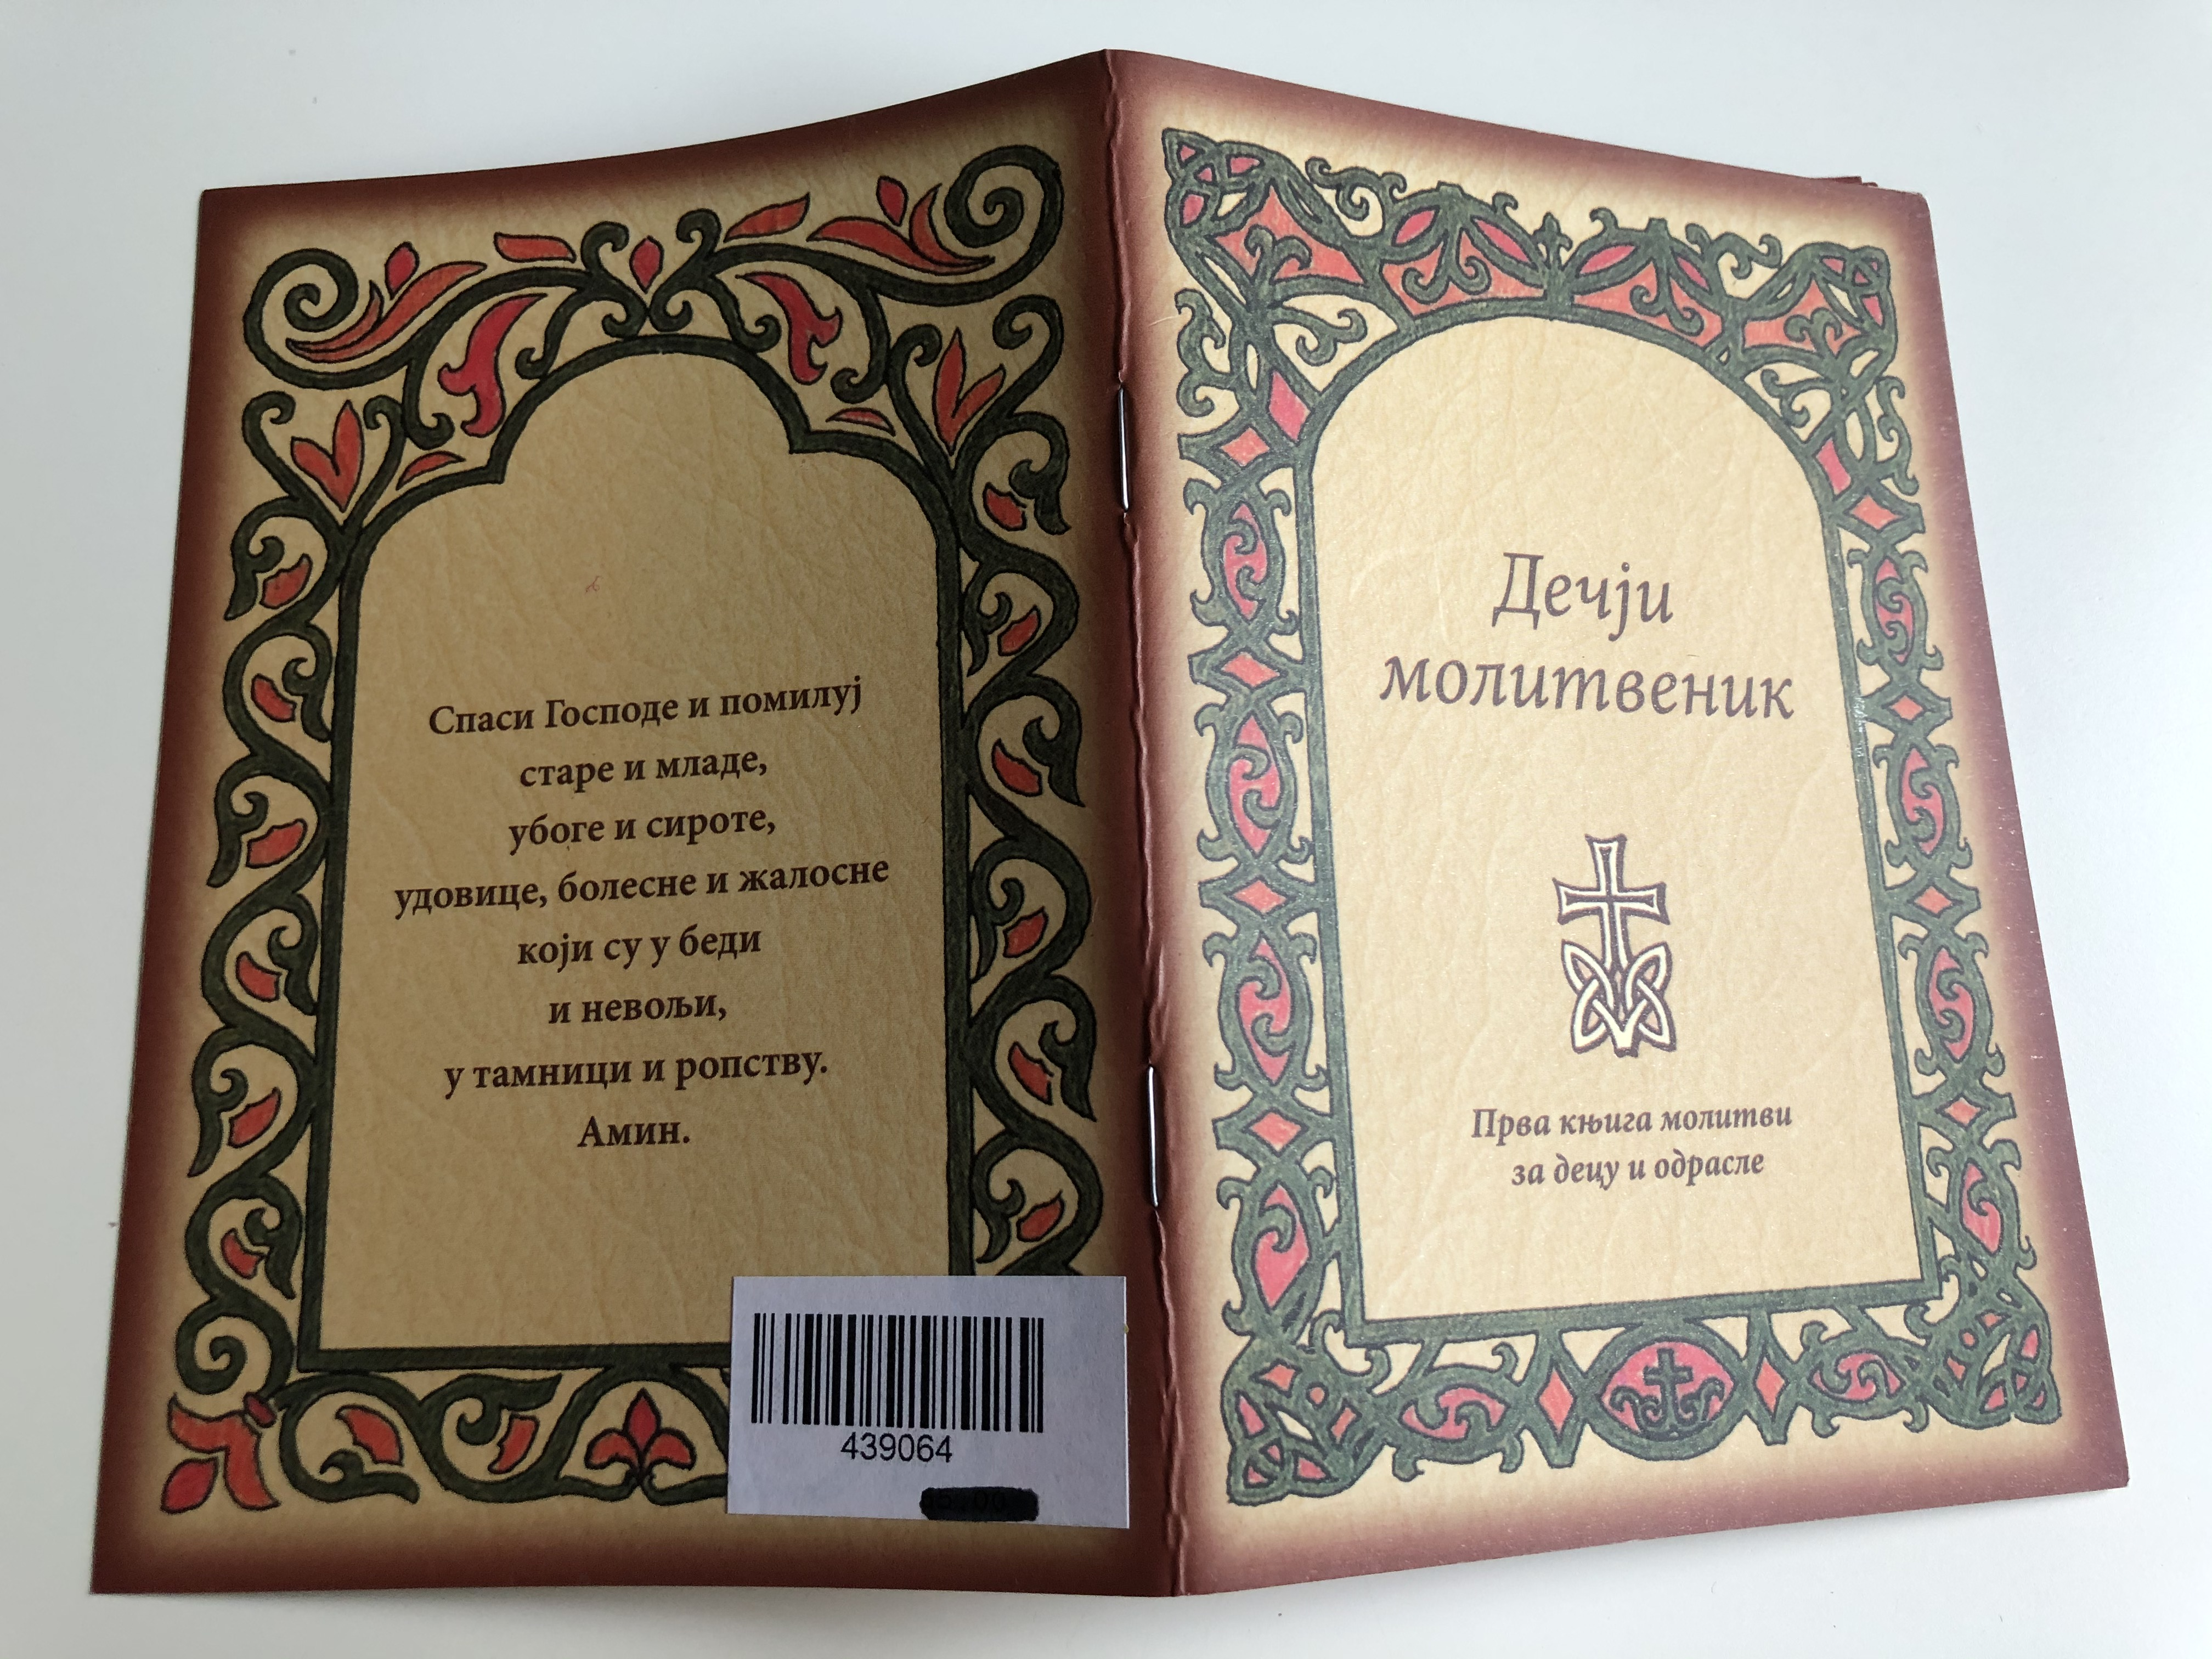 -serbian-orthodox-children-s-prayer-booklet-11.jpg